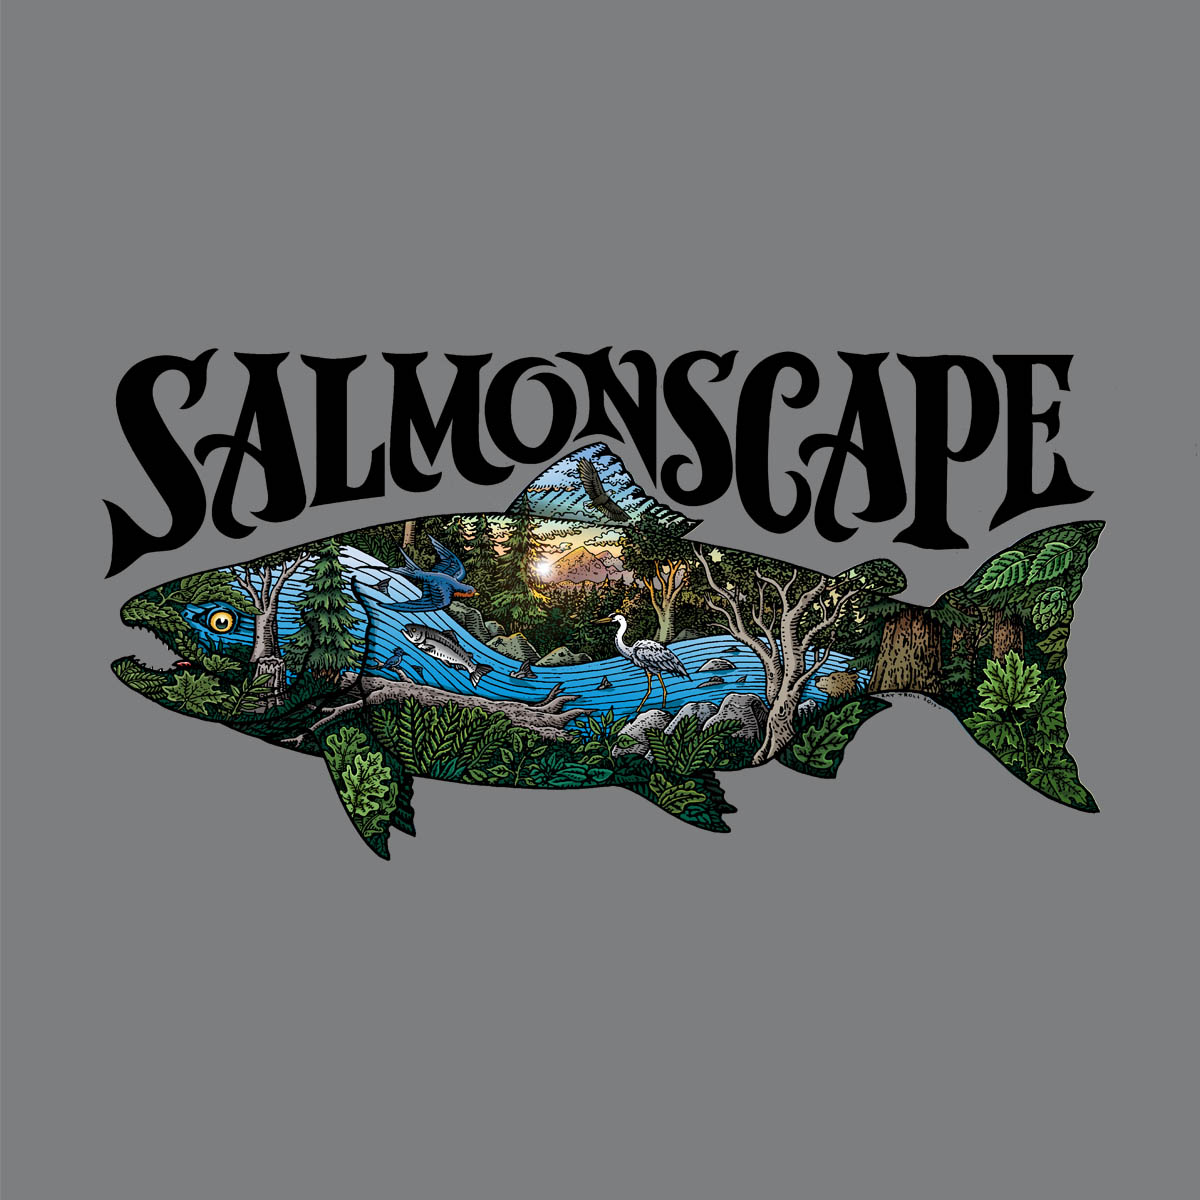 590 - Salmonscape